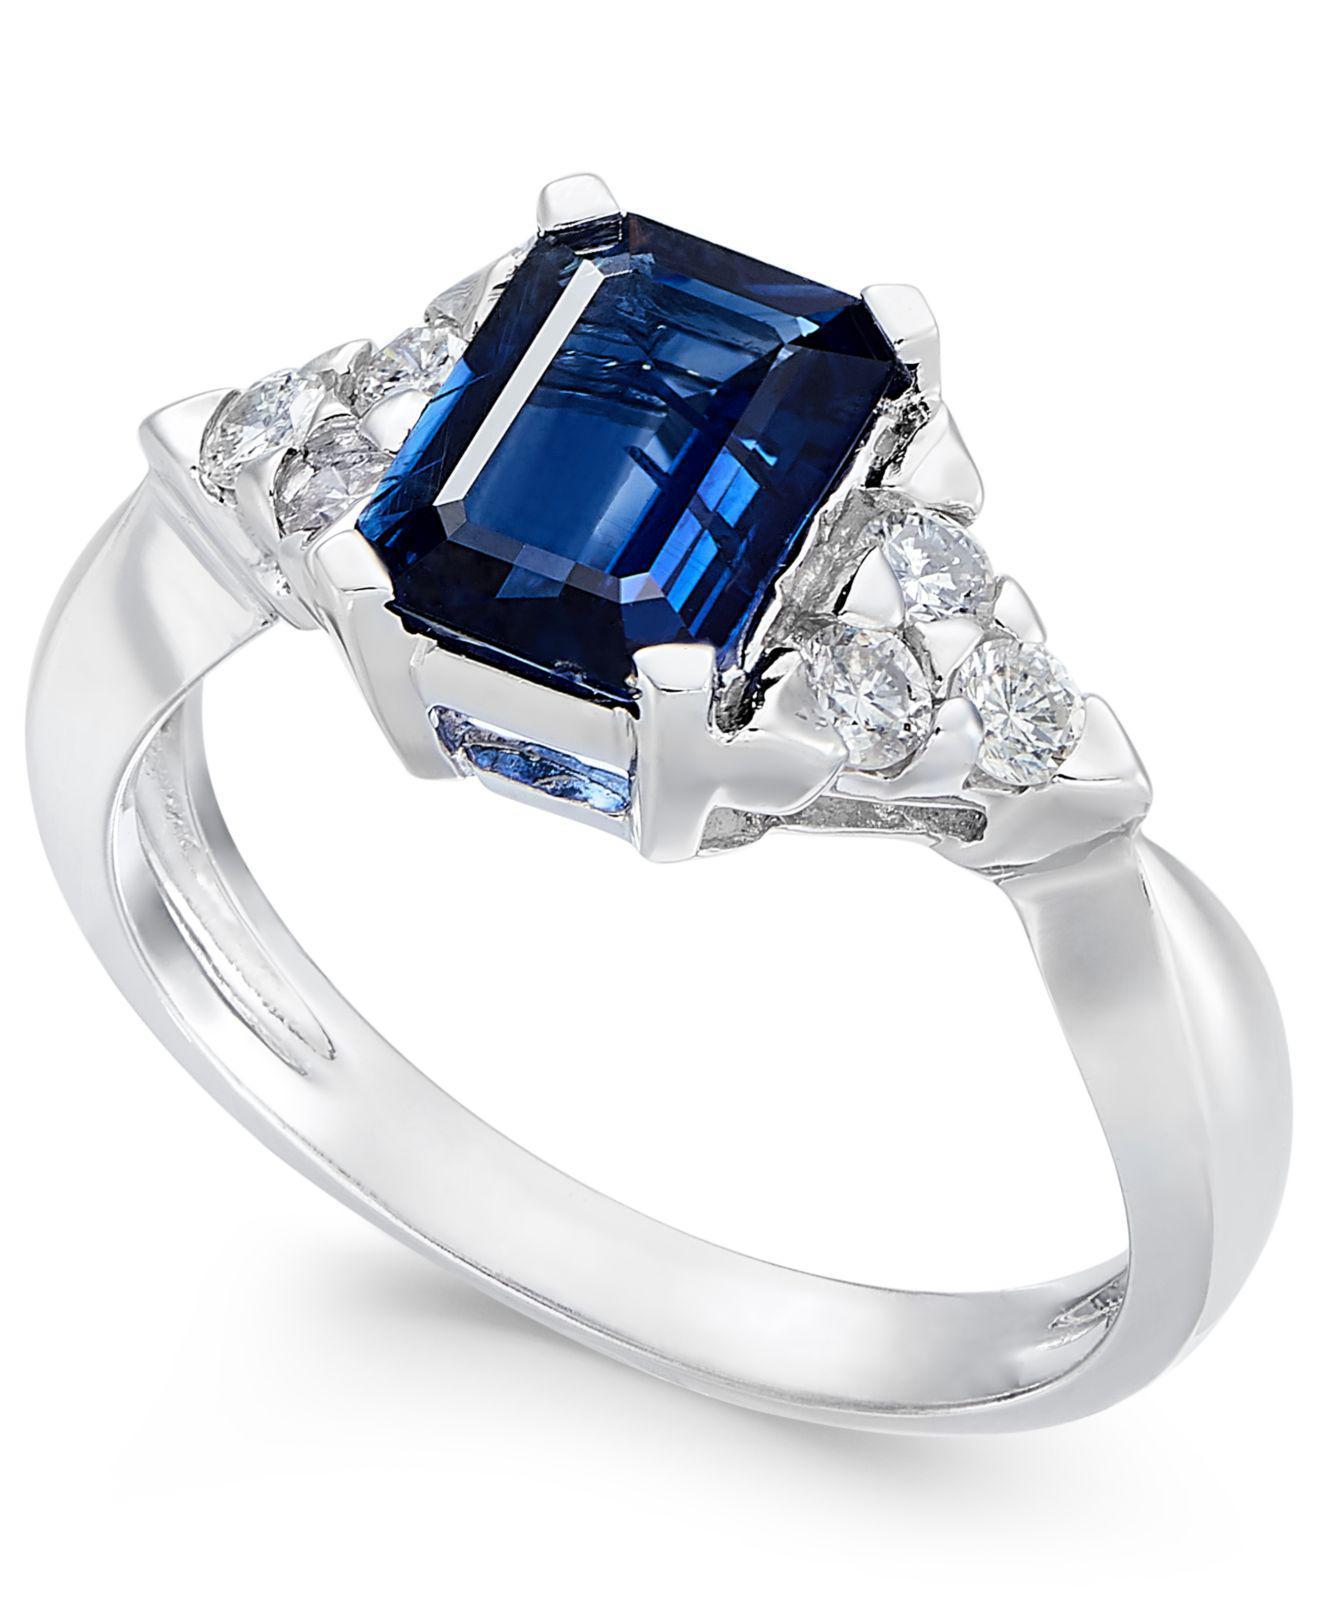 c4a5f050b Macy's Sapphire (1-3/4 Ct. T.w.) & Diamond (1/4 Ct. T.w.) Ring In ...